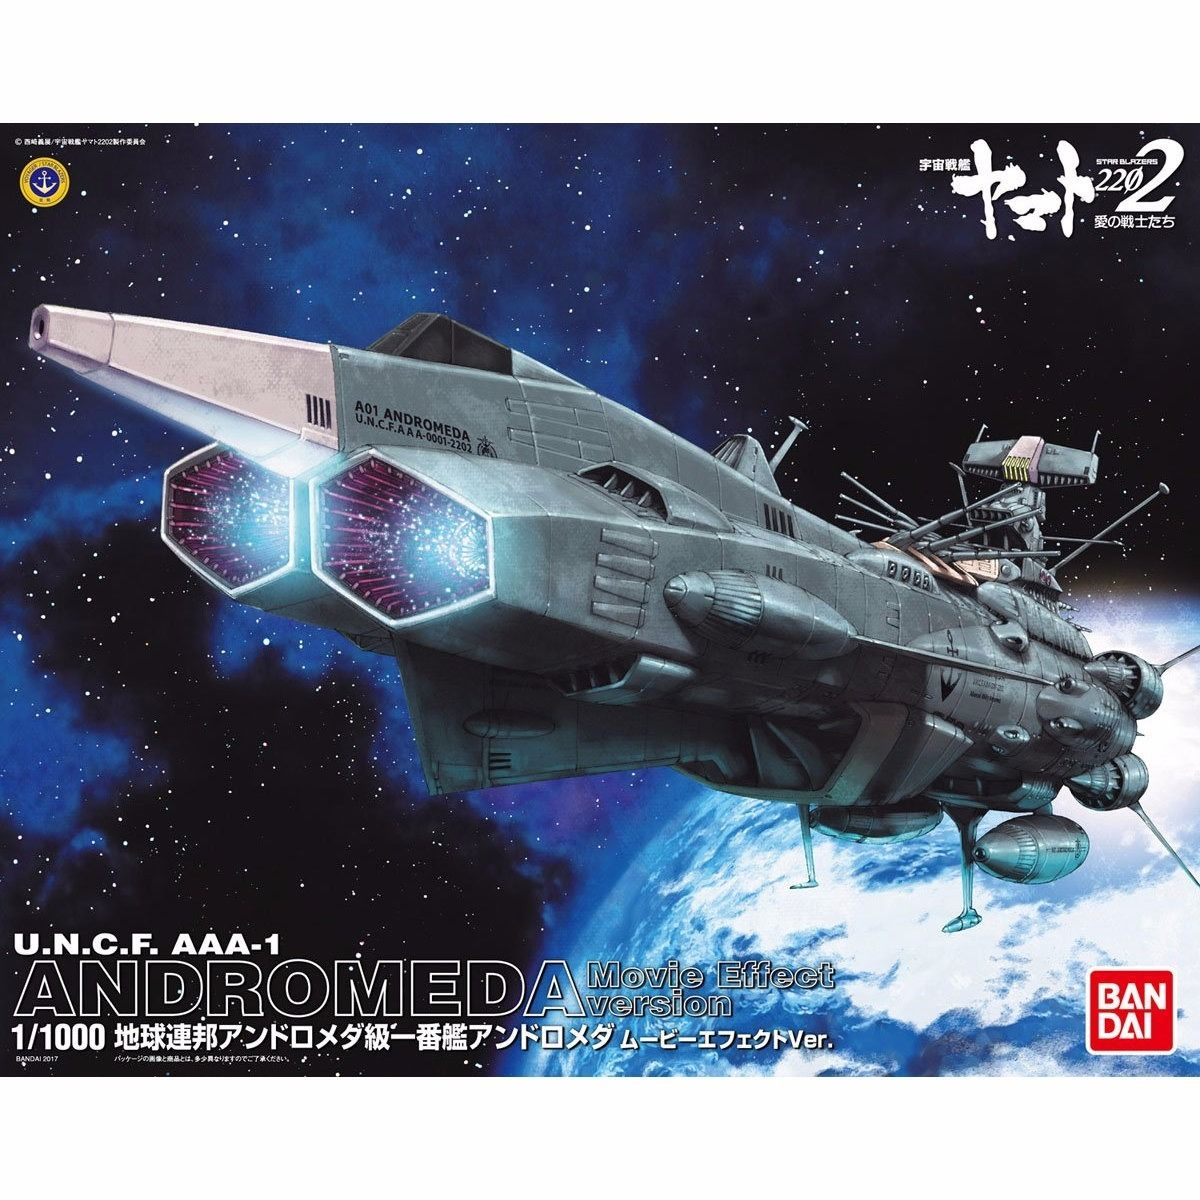 Bandai Hobby Star Blazers 2202 Battleship Yamato Andromeda Movie Effect Version 1 1000 Model Kit by Bandai Hobby